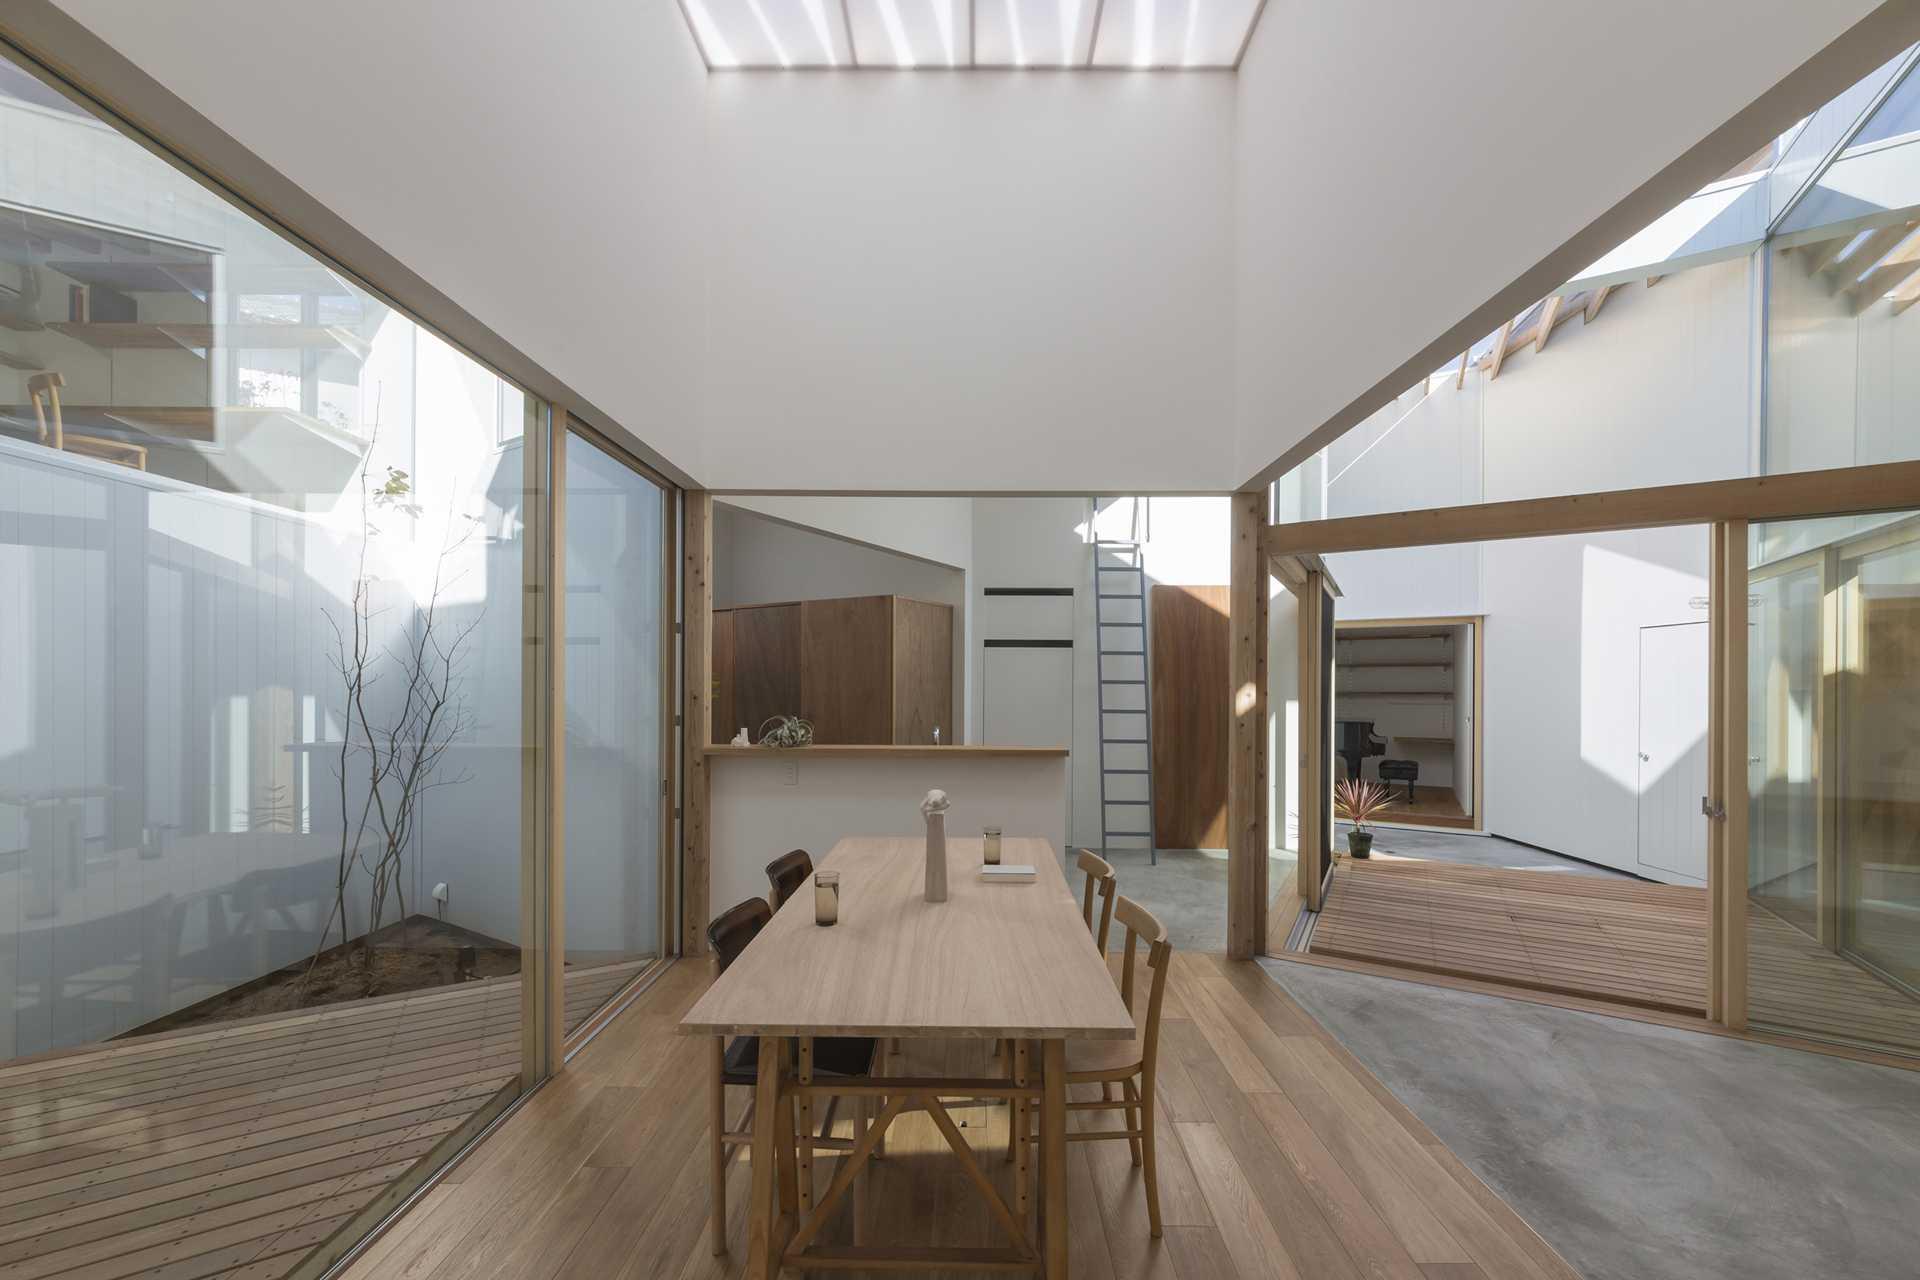 House in Hokusetsu  - 45 7 45